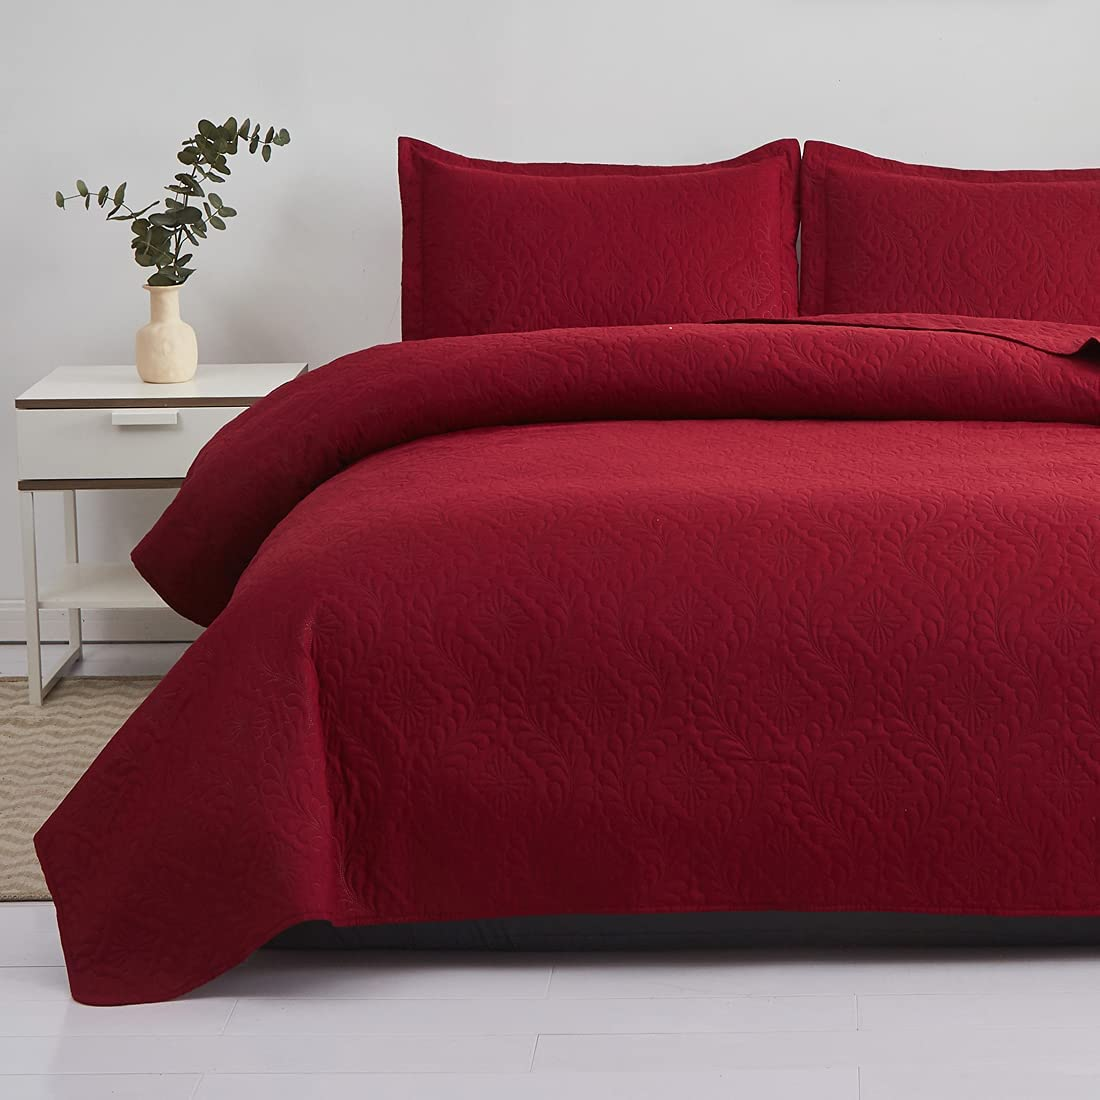 OFFicial shop Burgundy Quilts Full New sales Queen Microfiber Size Lightweight Bedspraed